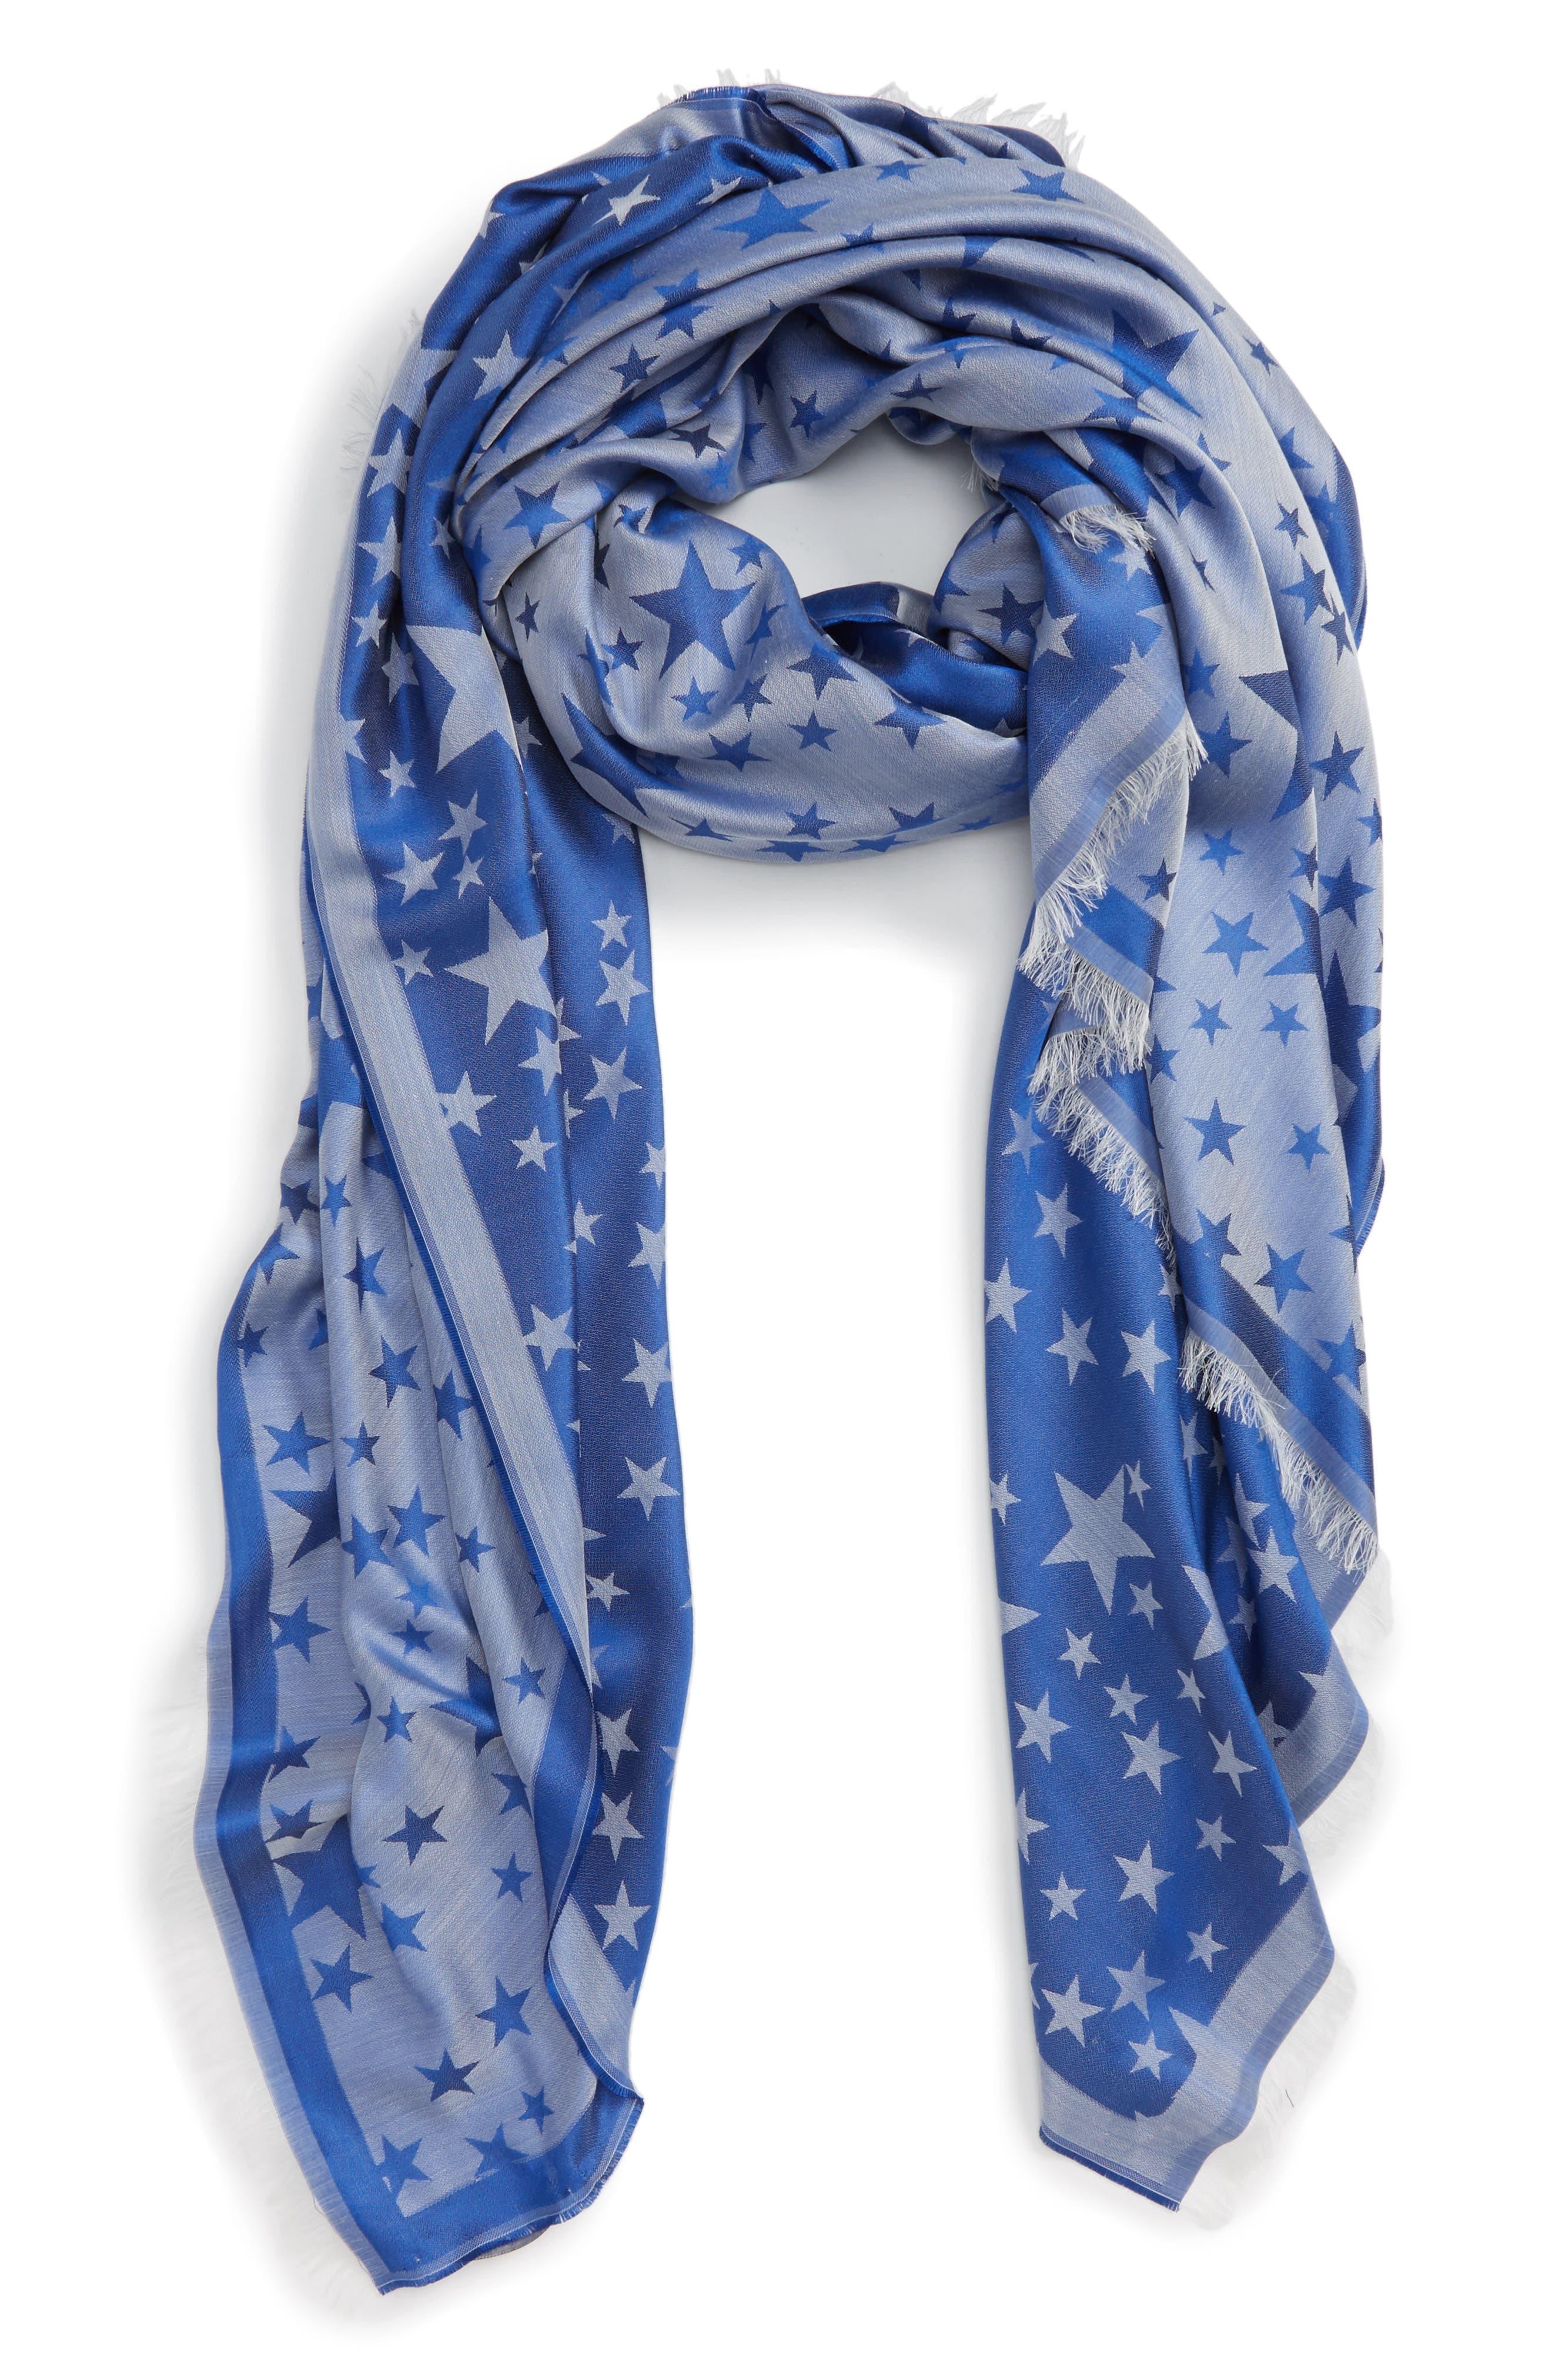 Main Image - Stella McCartney Star Jacquard Silk & Modal Scarf